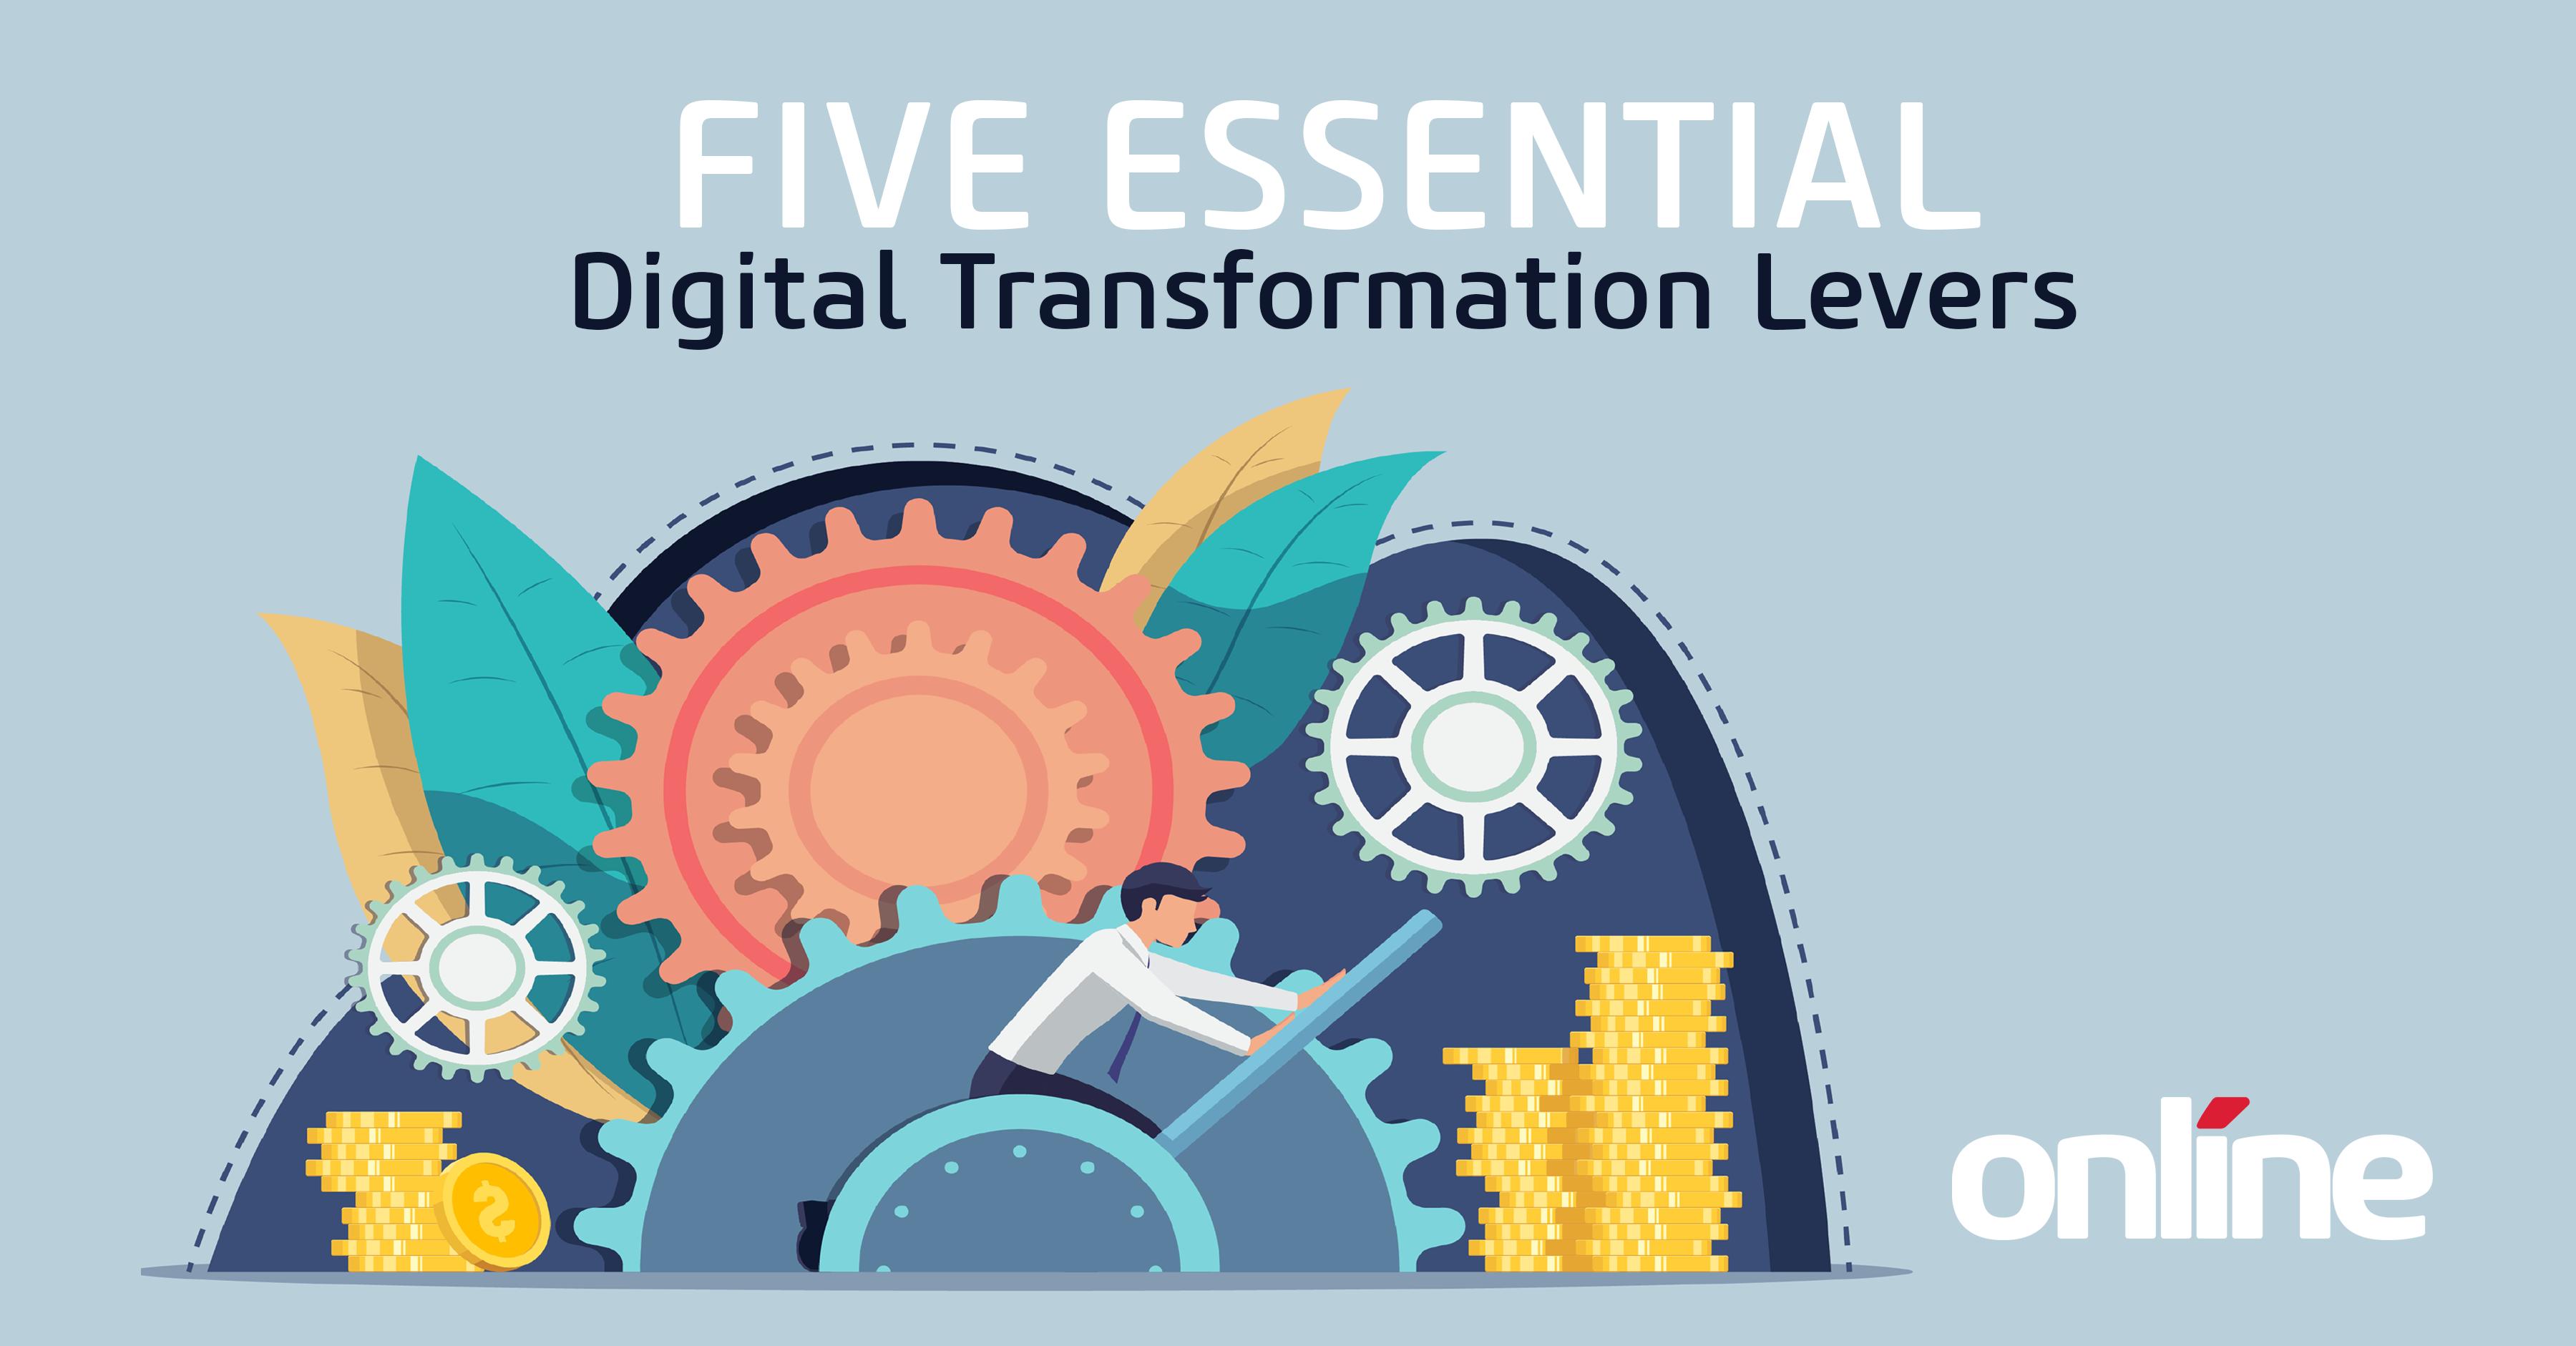 Digital Transformation Levers